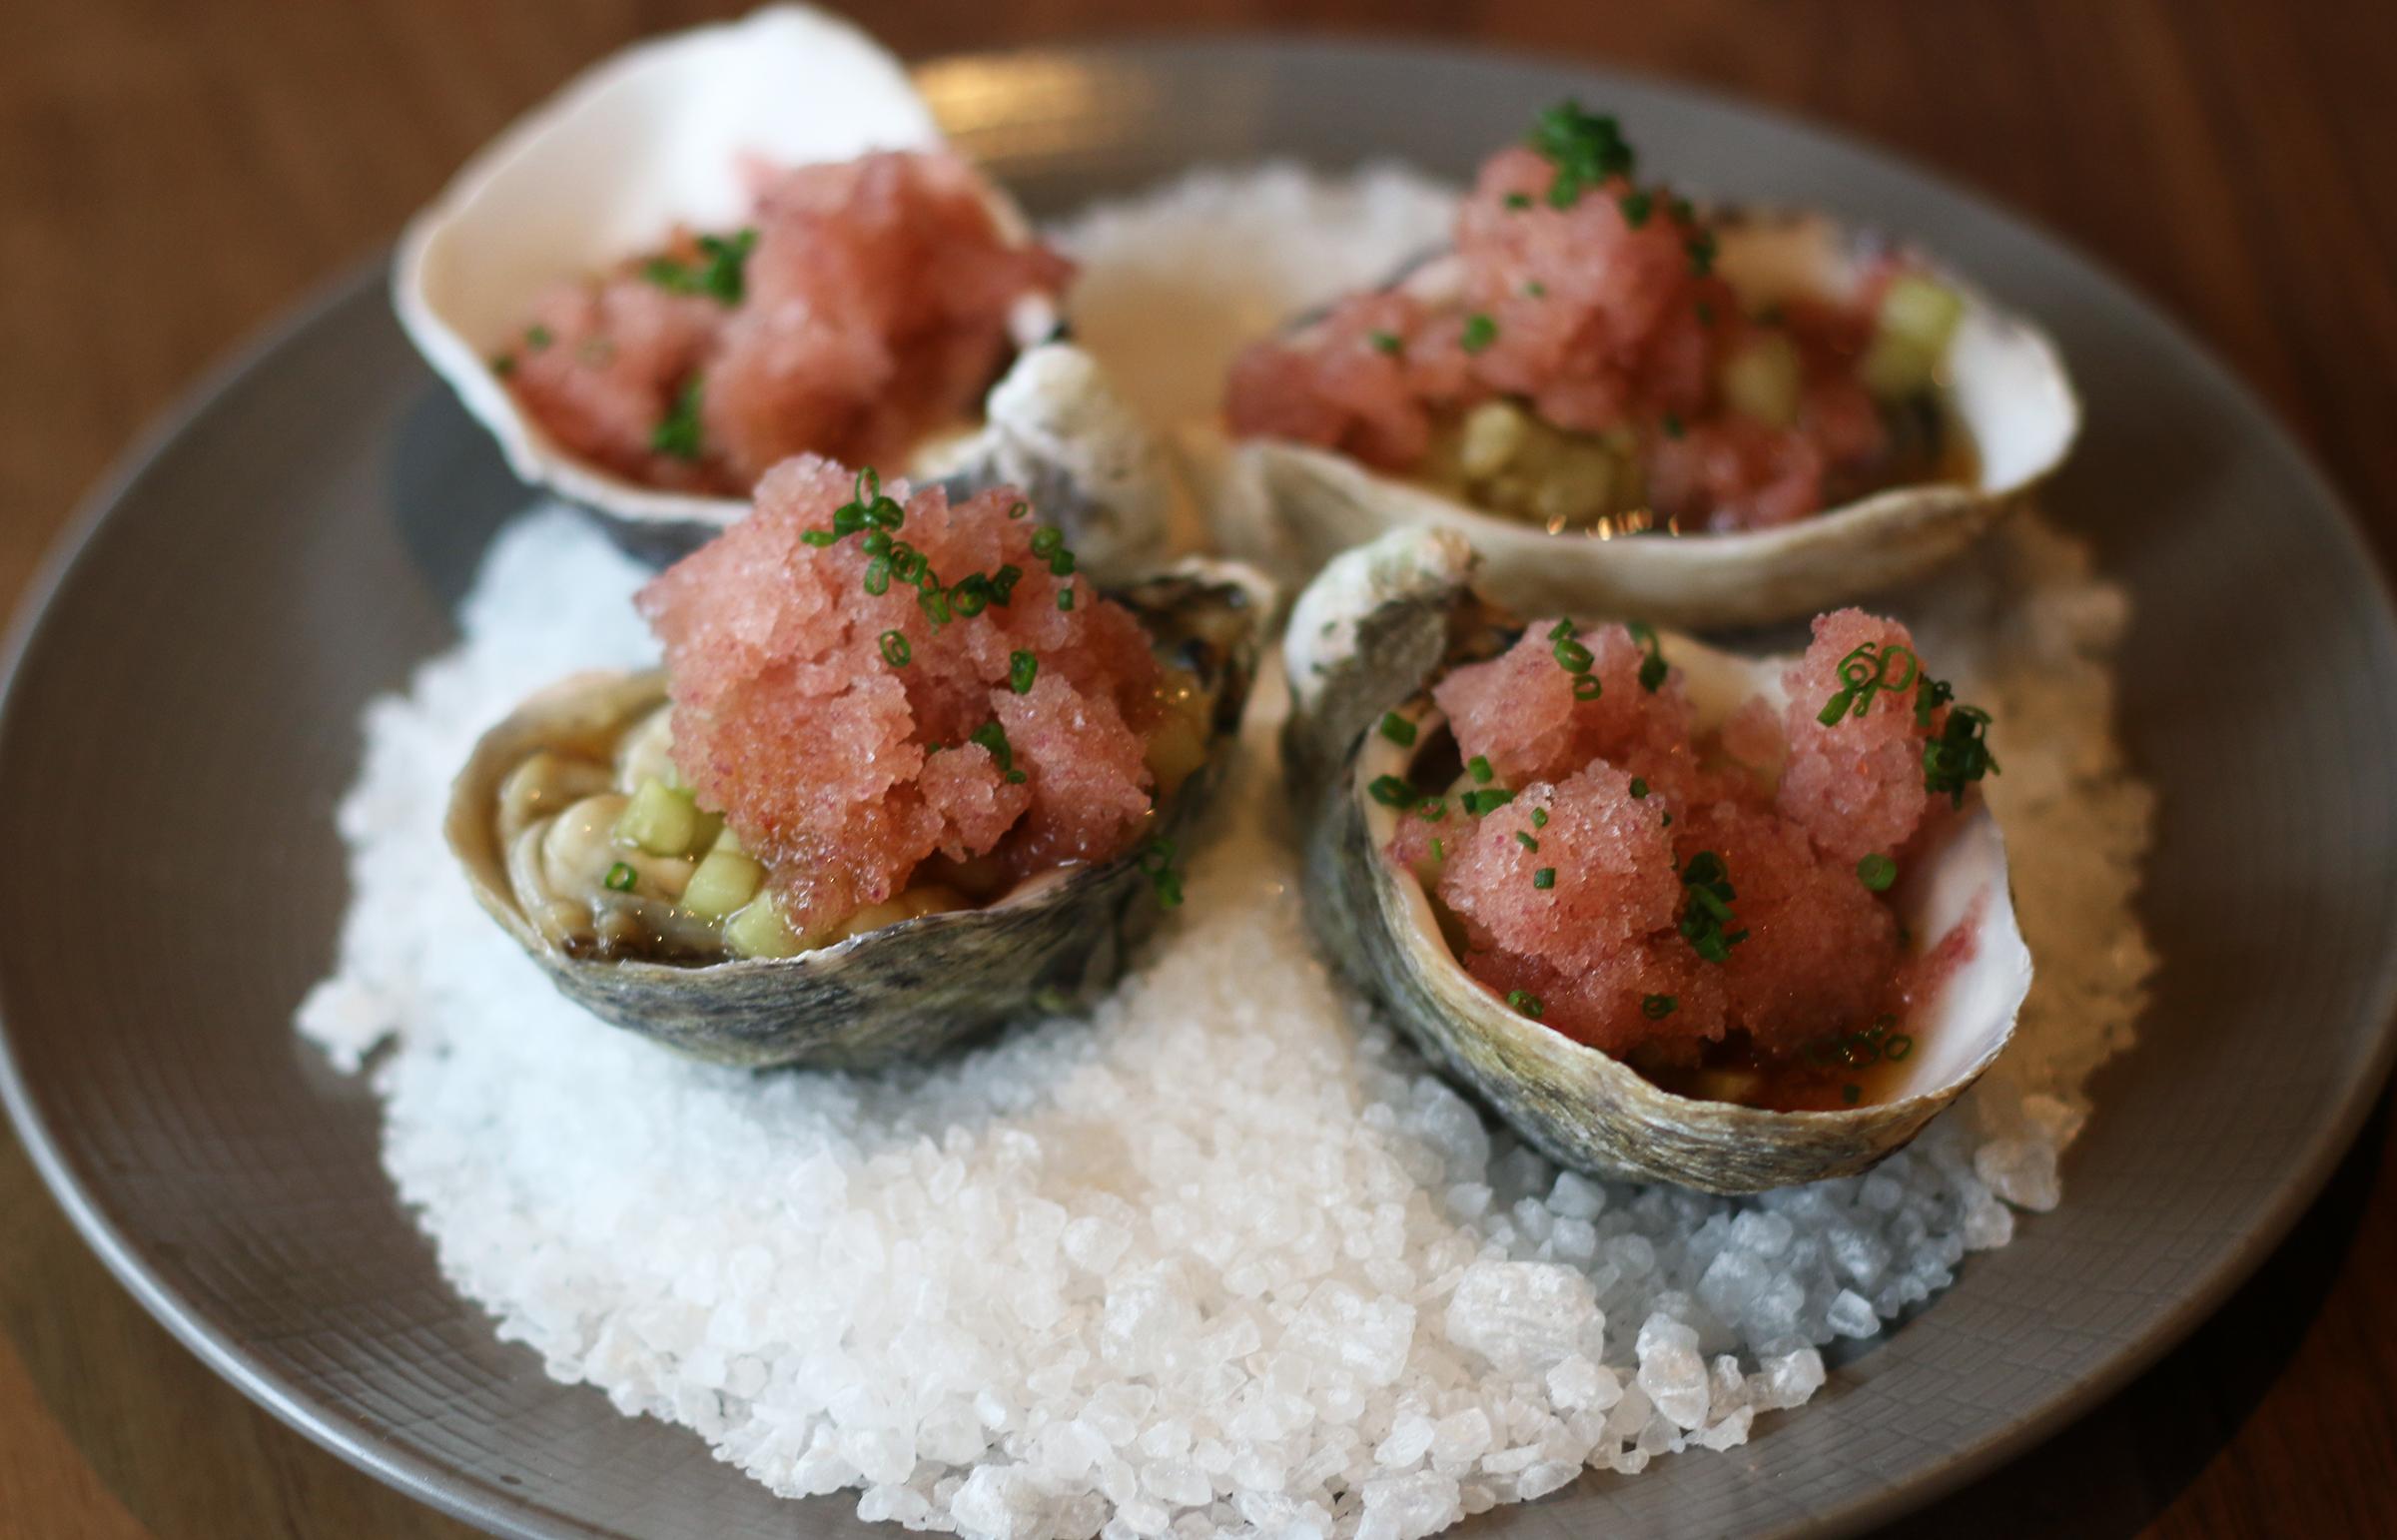 coromandel oysters:    seaweed kanzuri granita,cucumbers,oyster vinaigrette